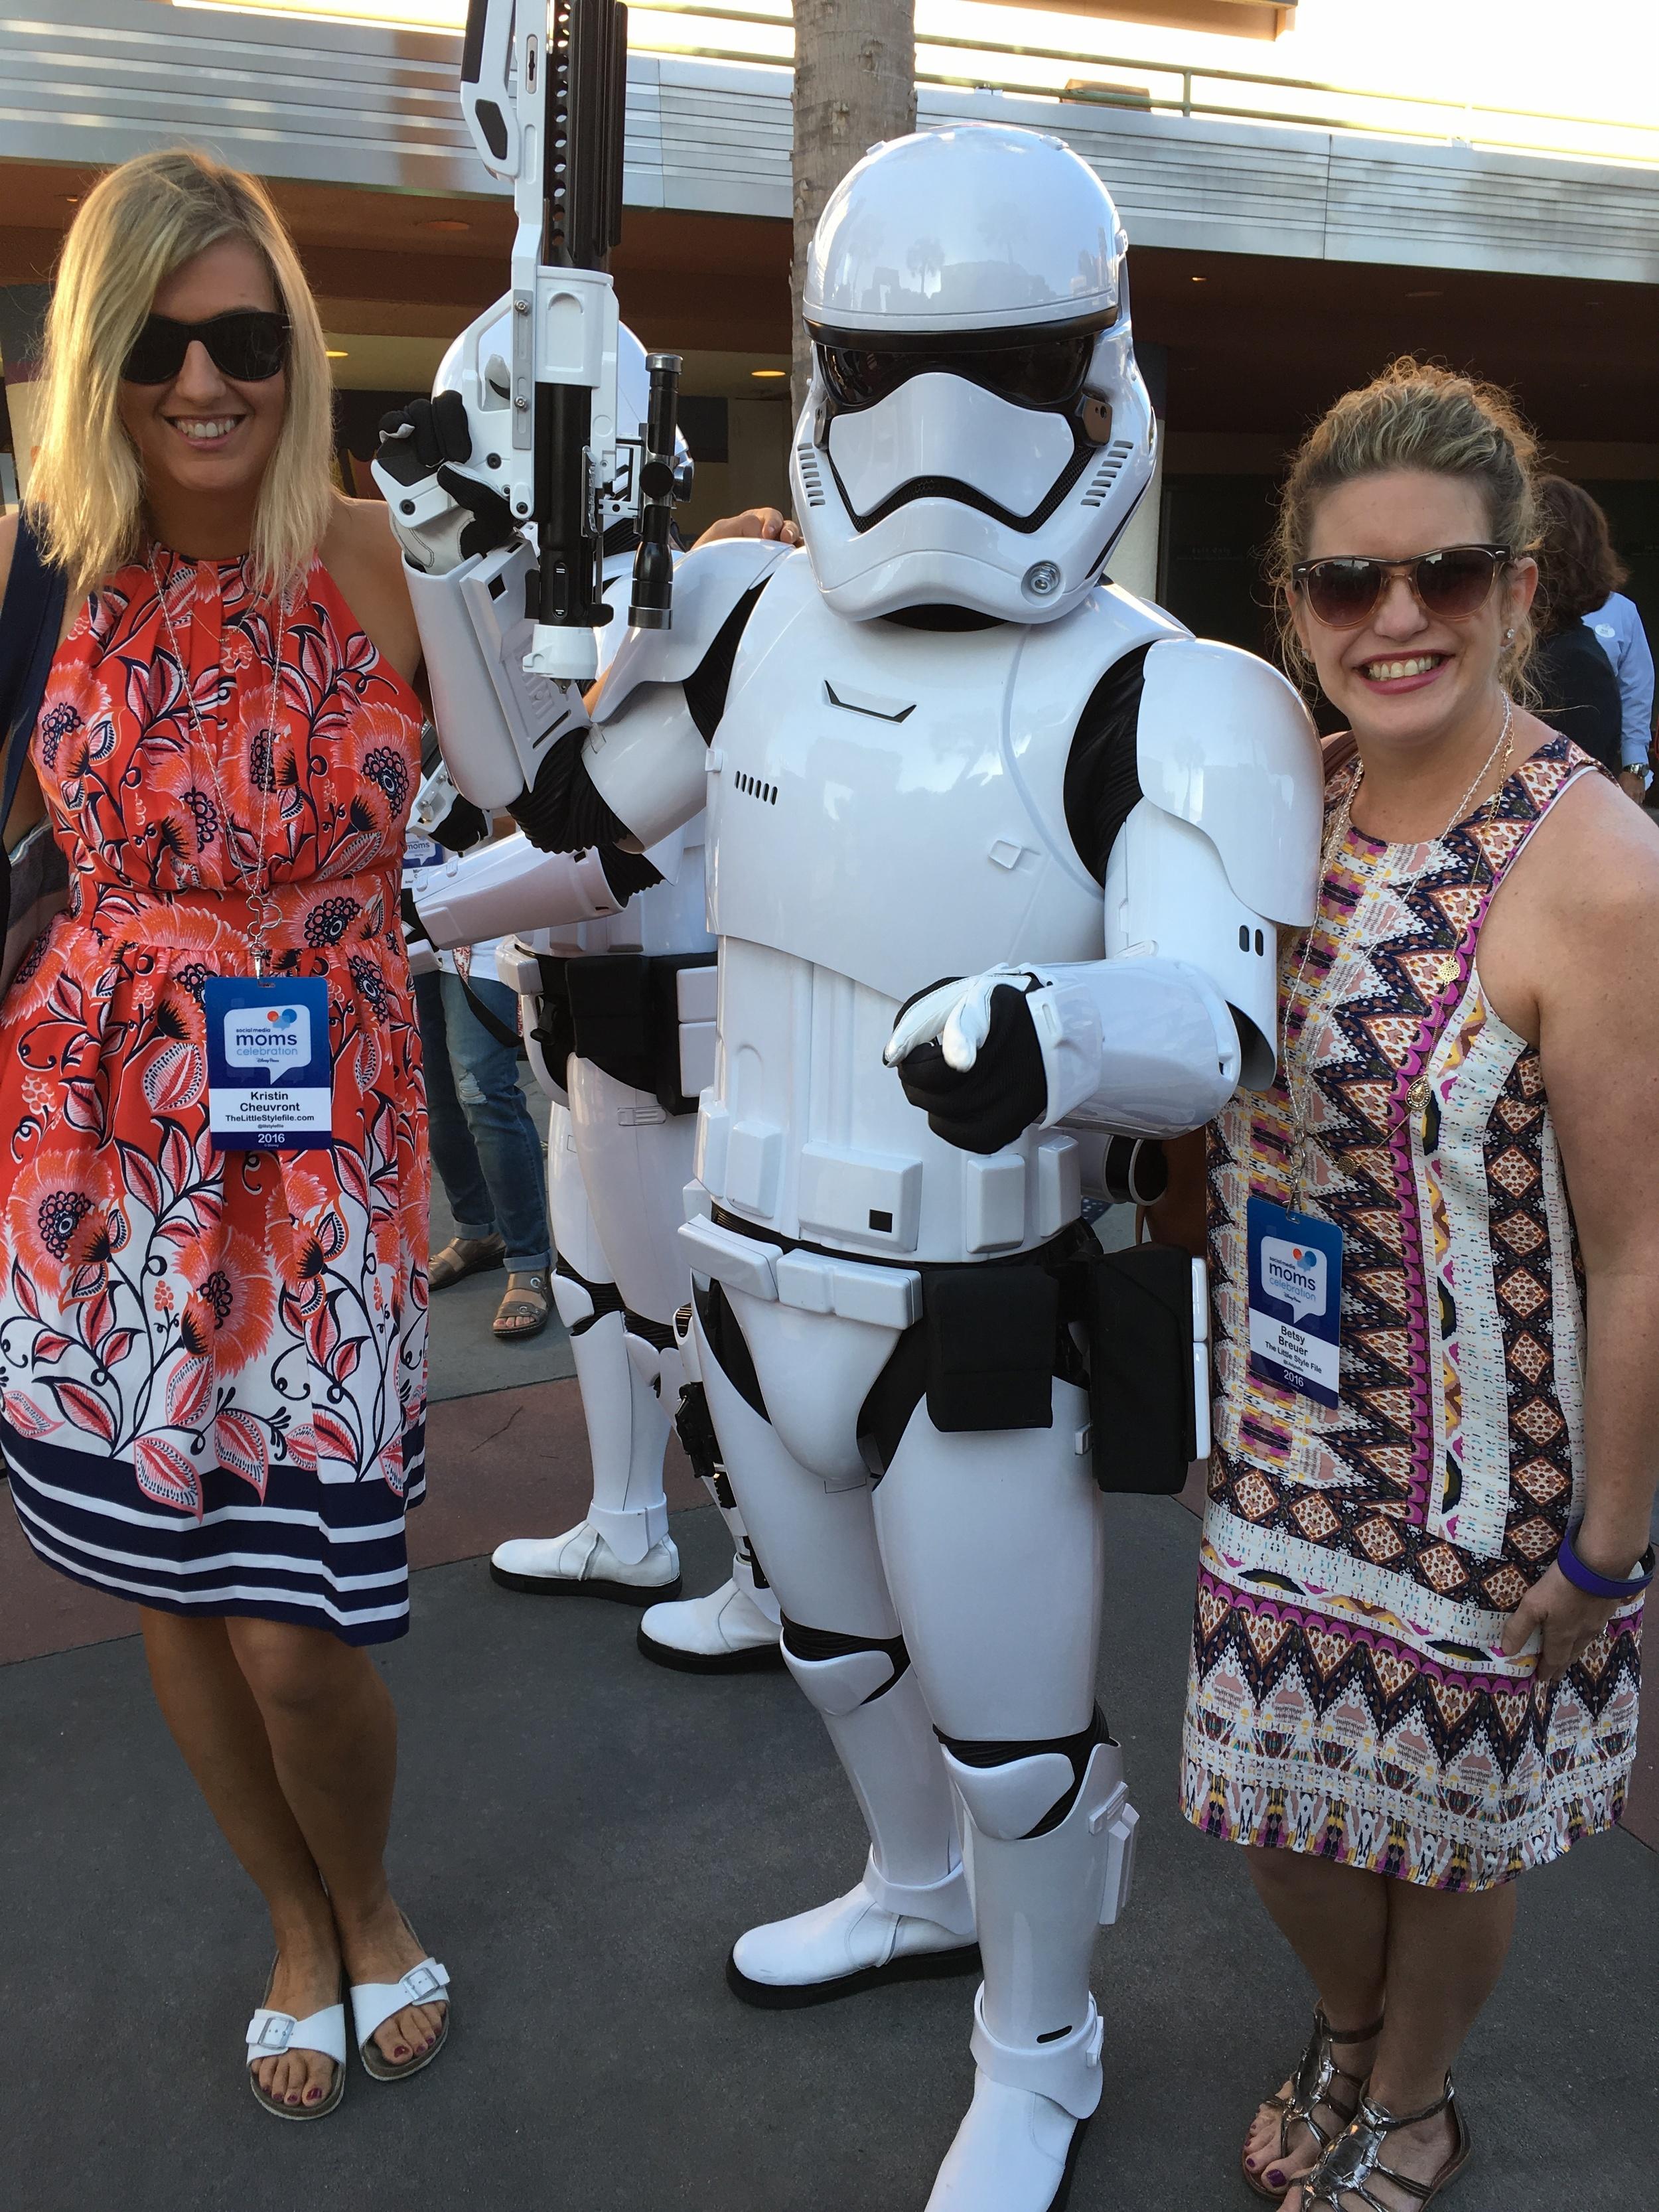 storm trooper selfie